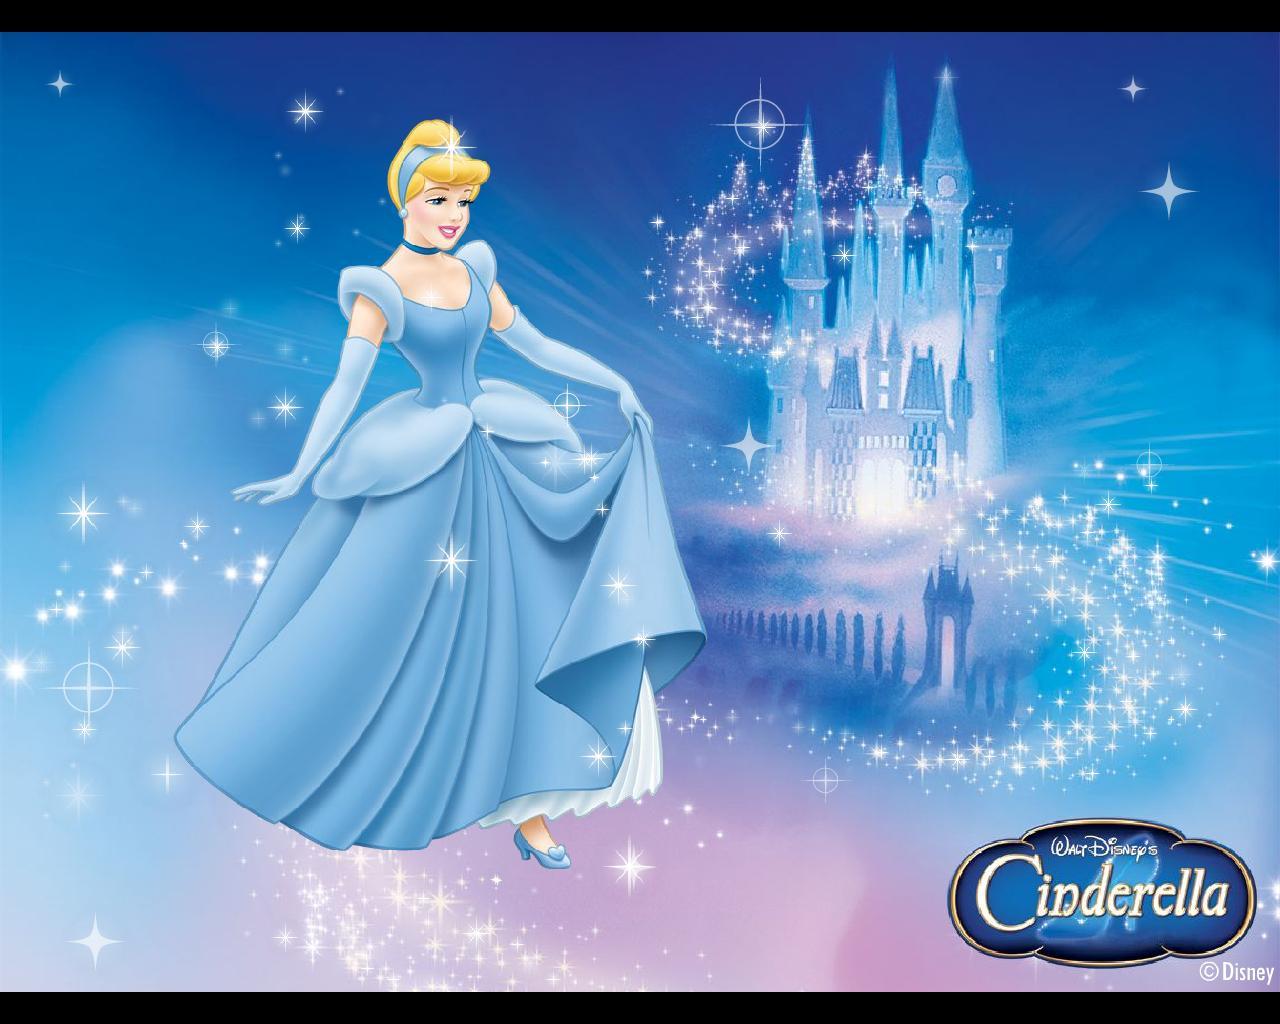 CinderelIa Images Cinderella HD Wallpaper And Background Photos